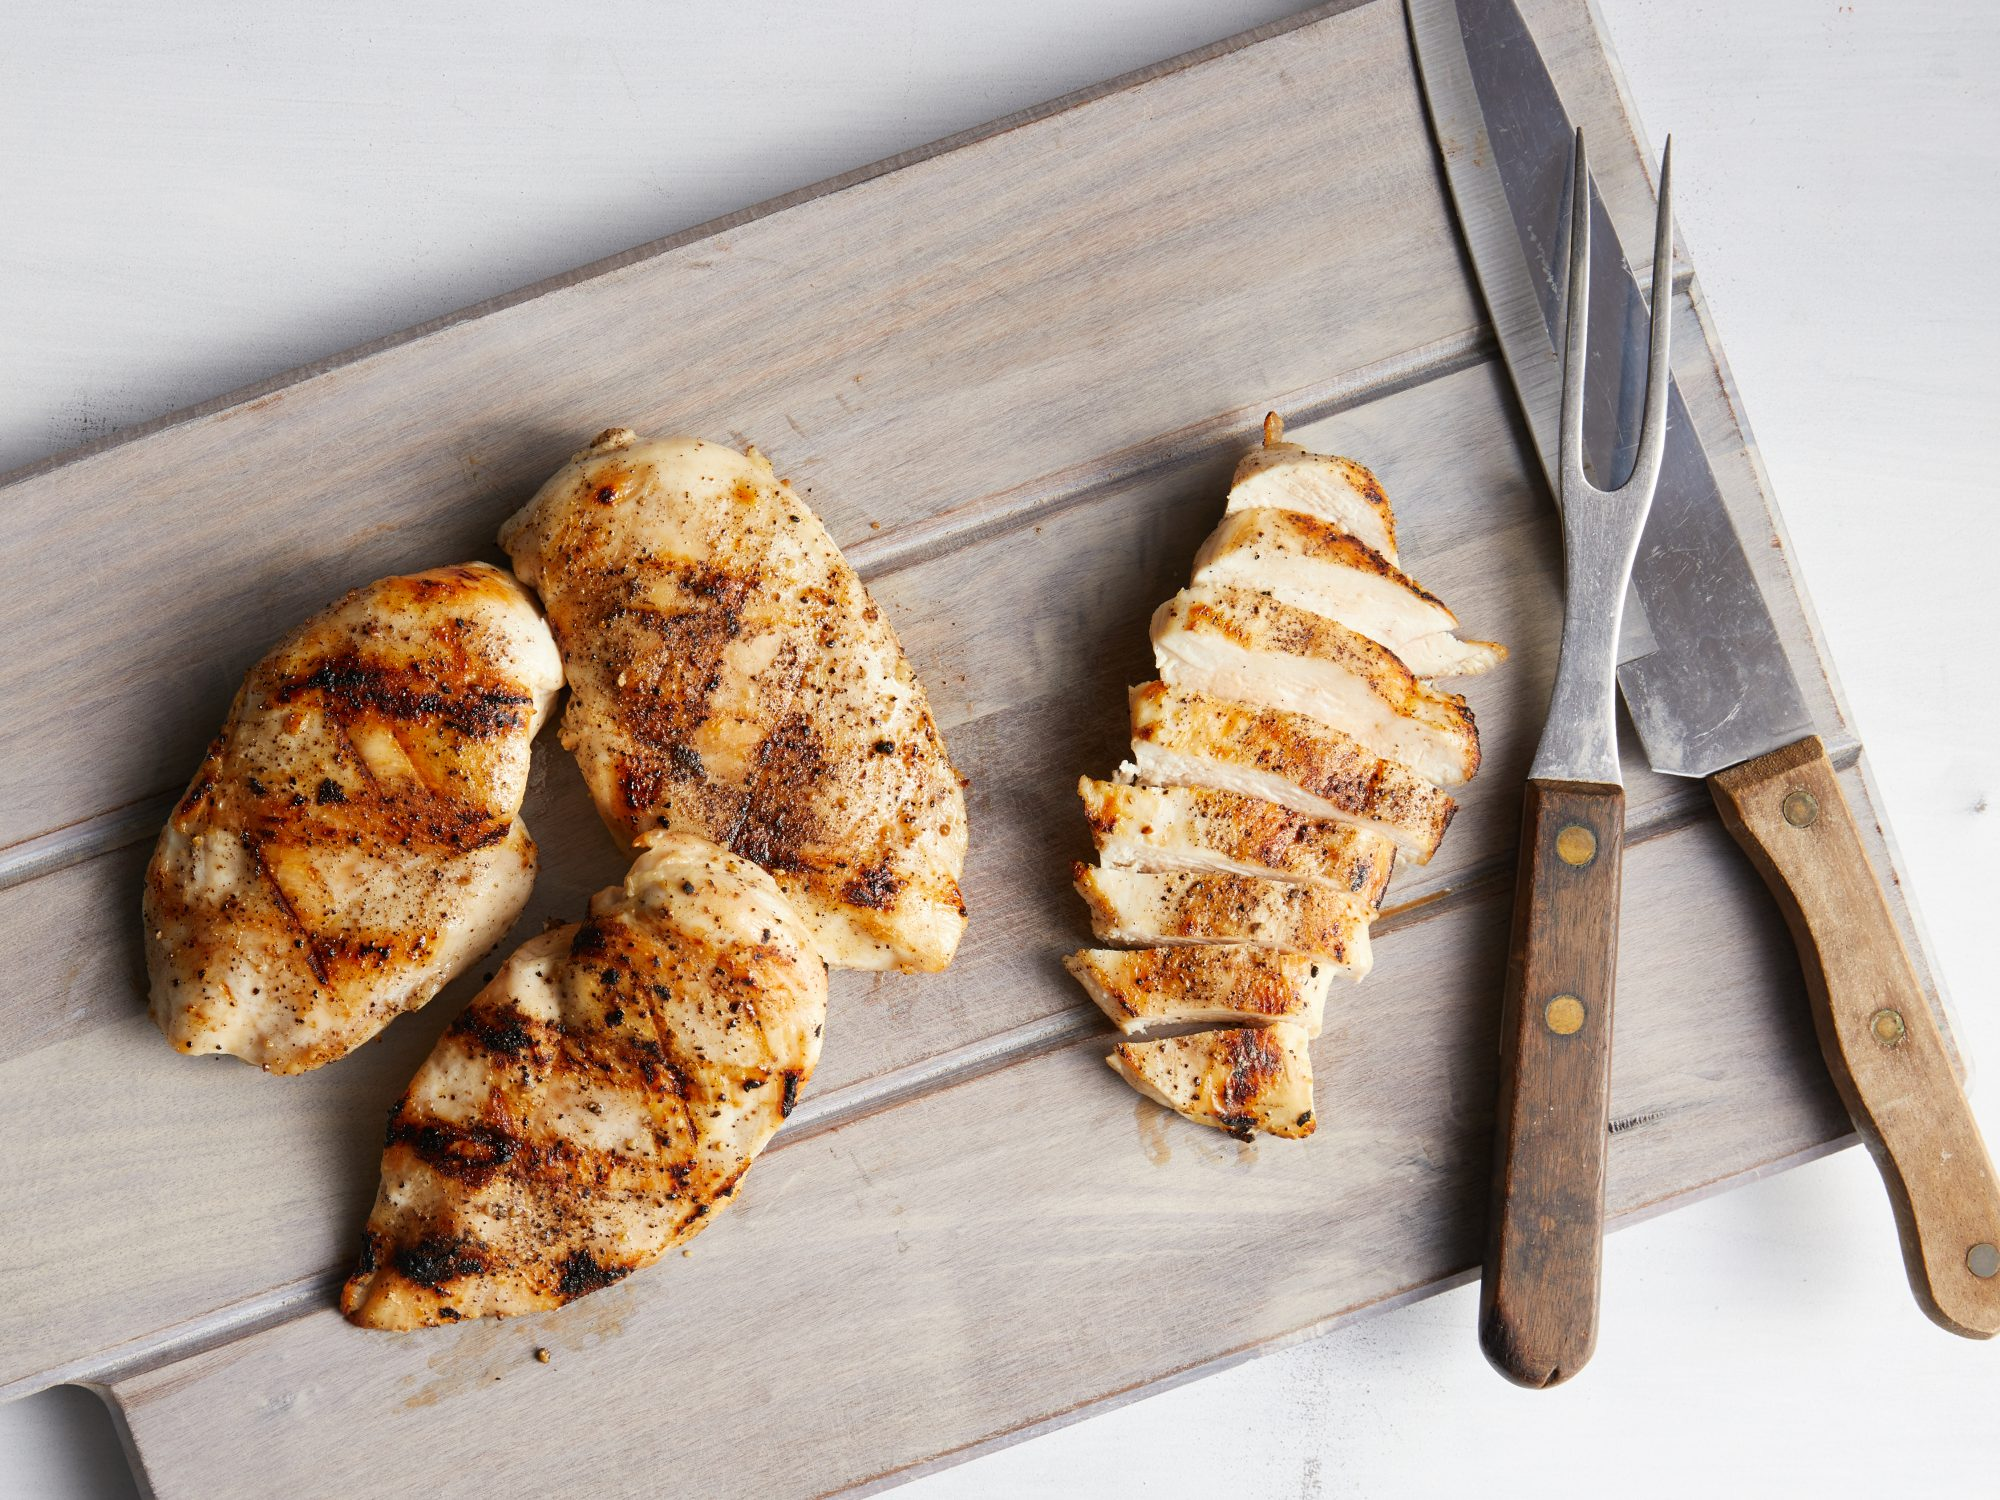 Mr Steak Grill Review Chicken Image